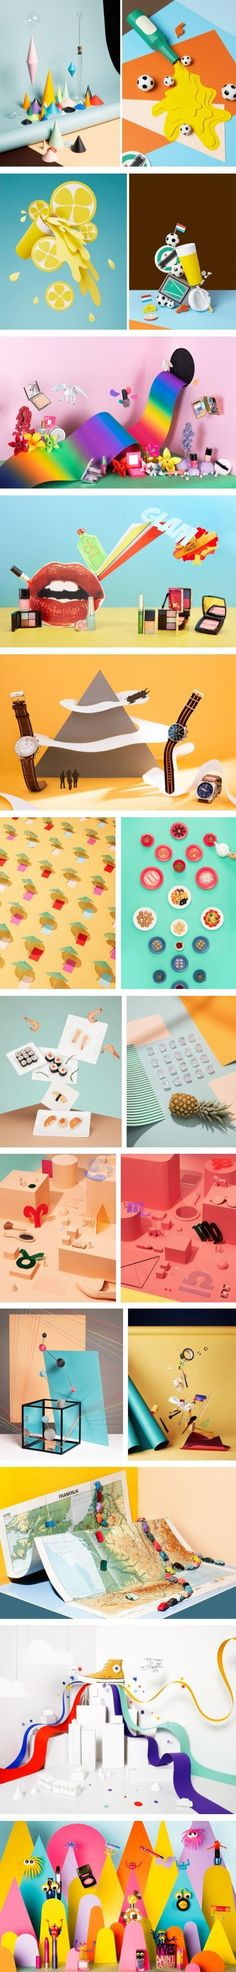 Pin de Flo H. en ▲Set design  Styling | Pinterest